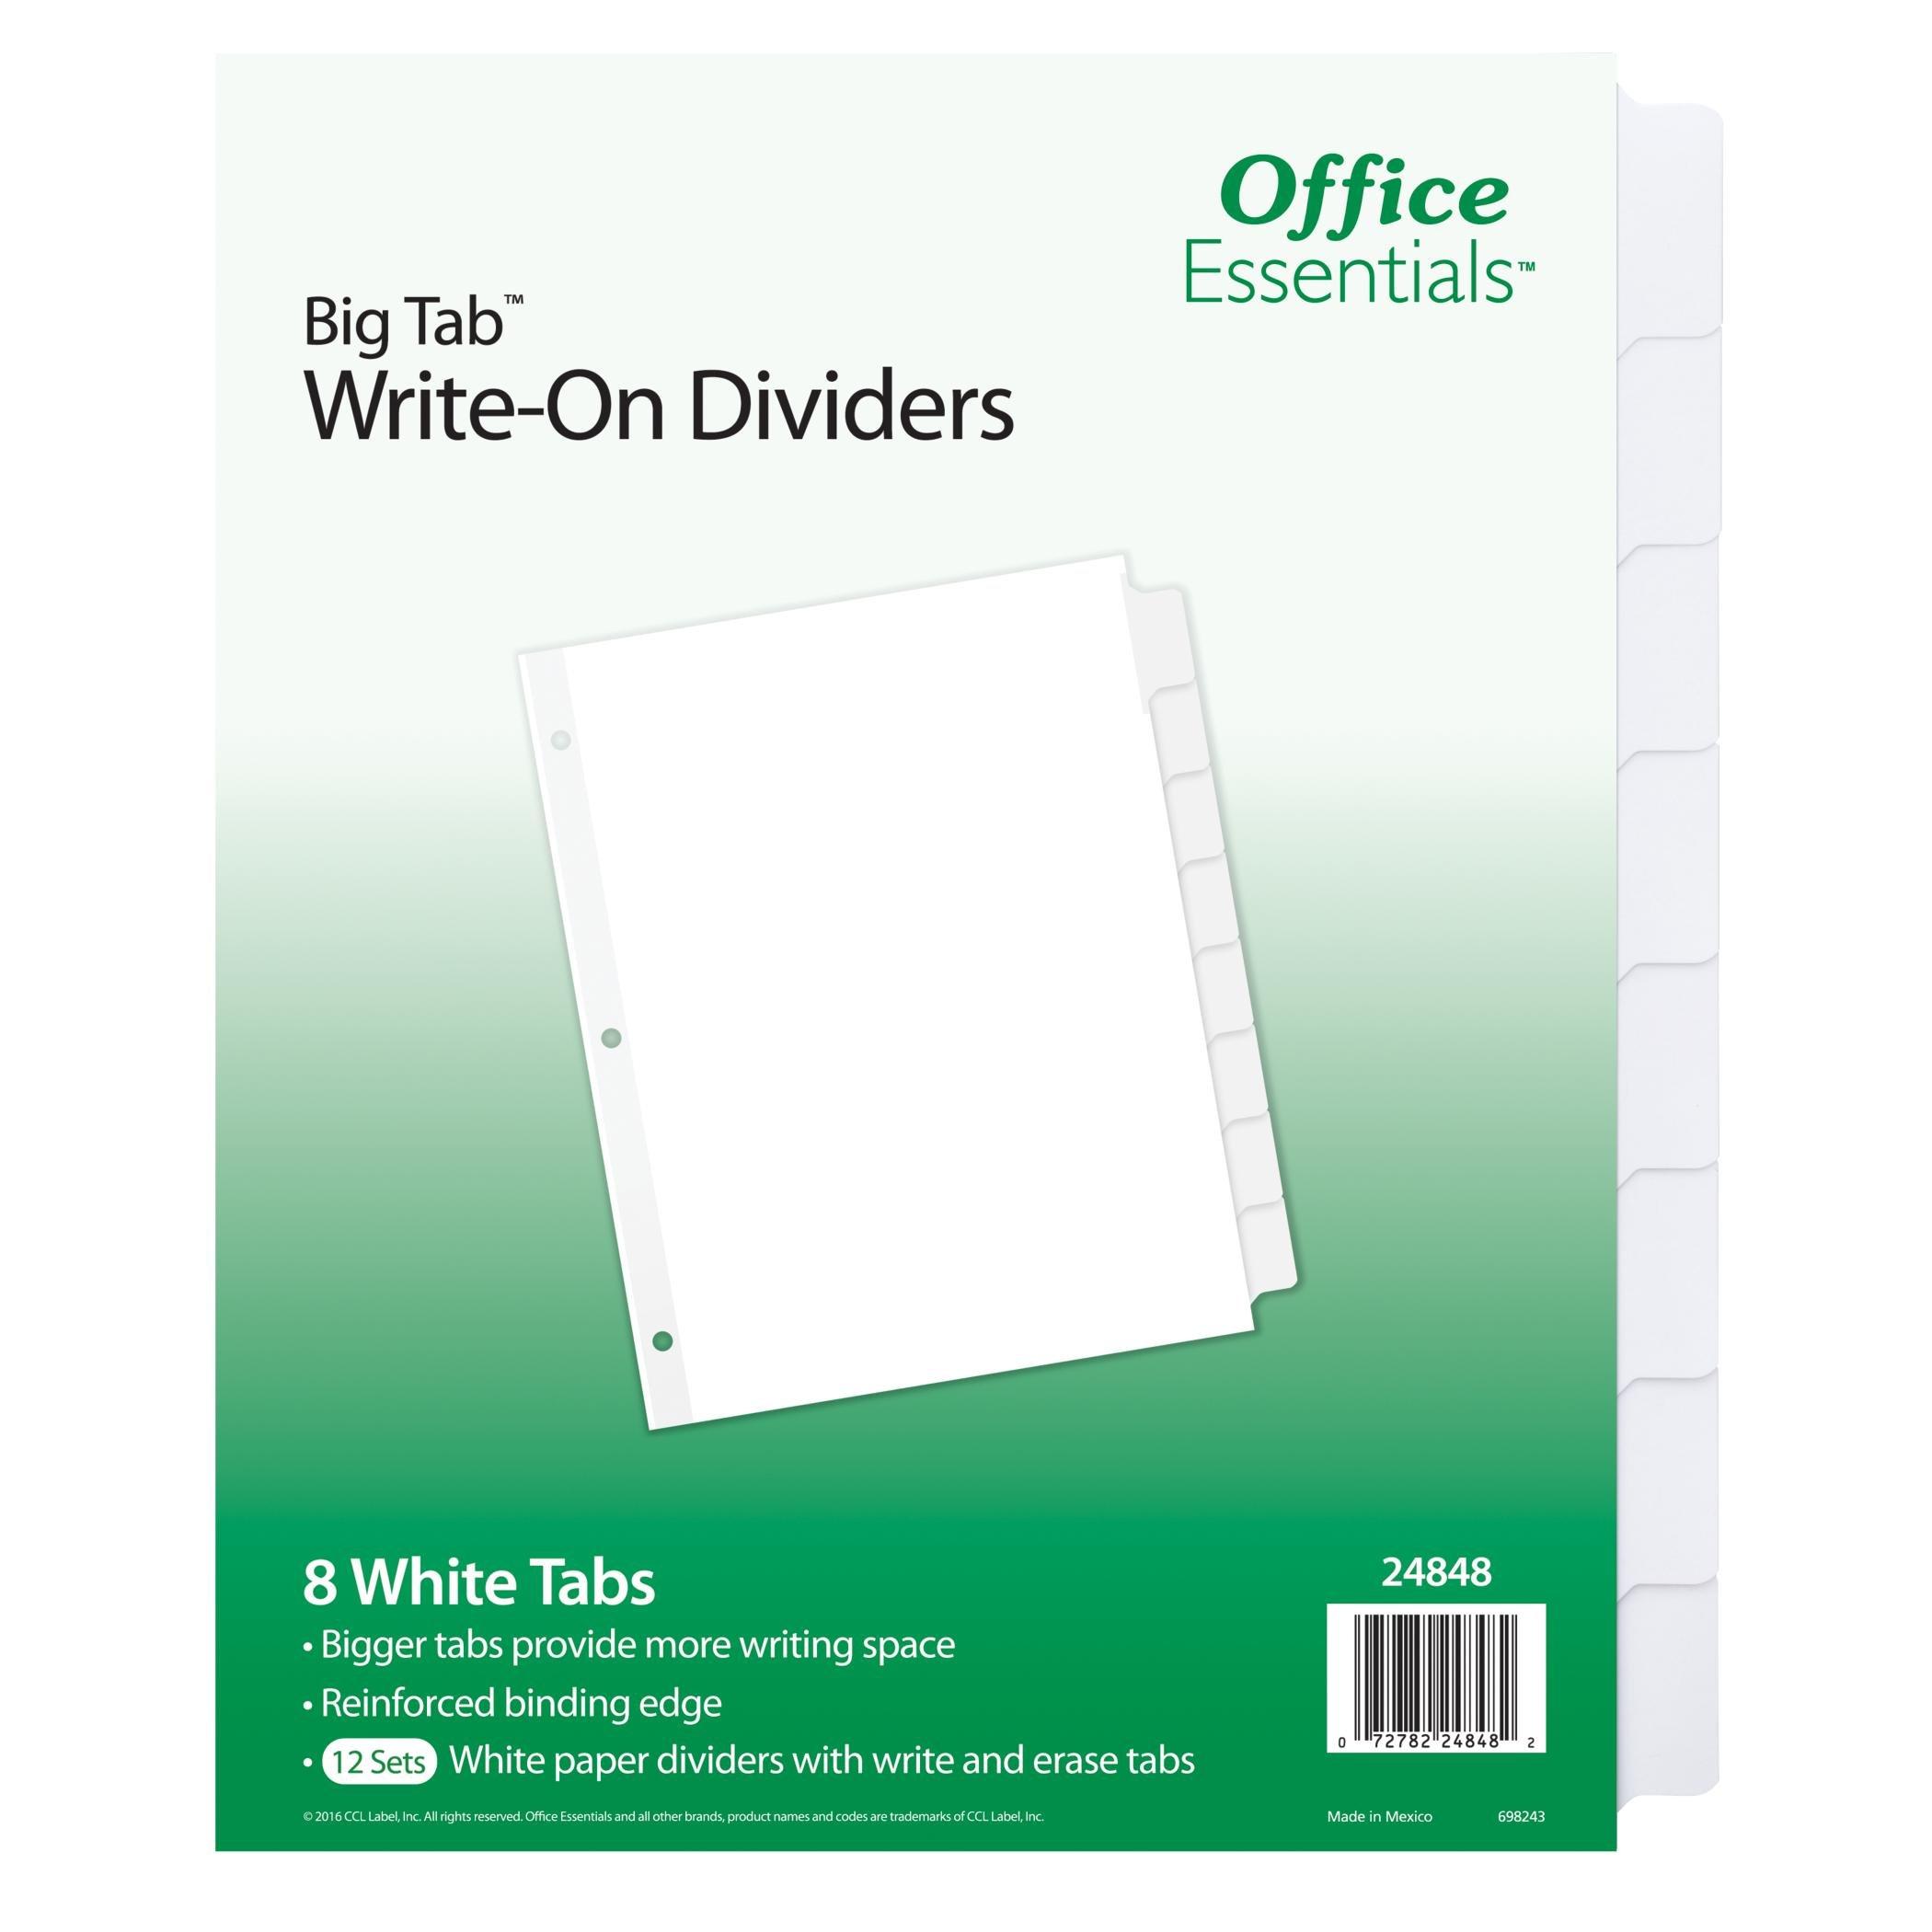 Office Essentials Big Tab Write-On Dividers, 8-1/2'' x 11'', 8 Tab, White Tab, White Body, 12 Pack (24848)